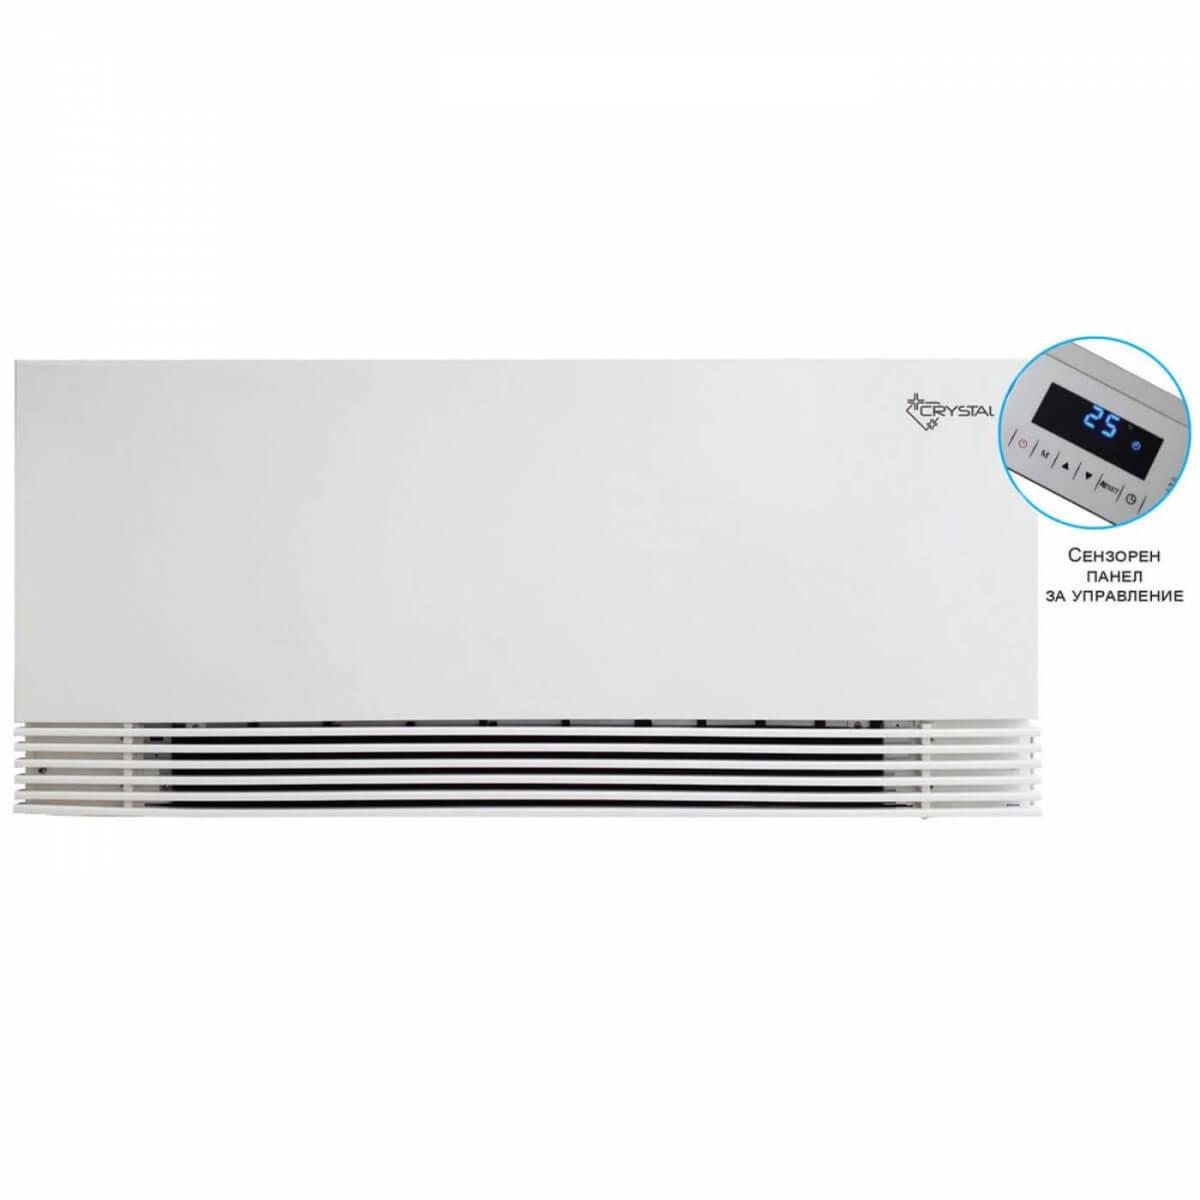 Вентилаторен конвектор Crystal BGR-800 L/R - 1